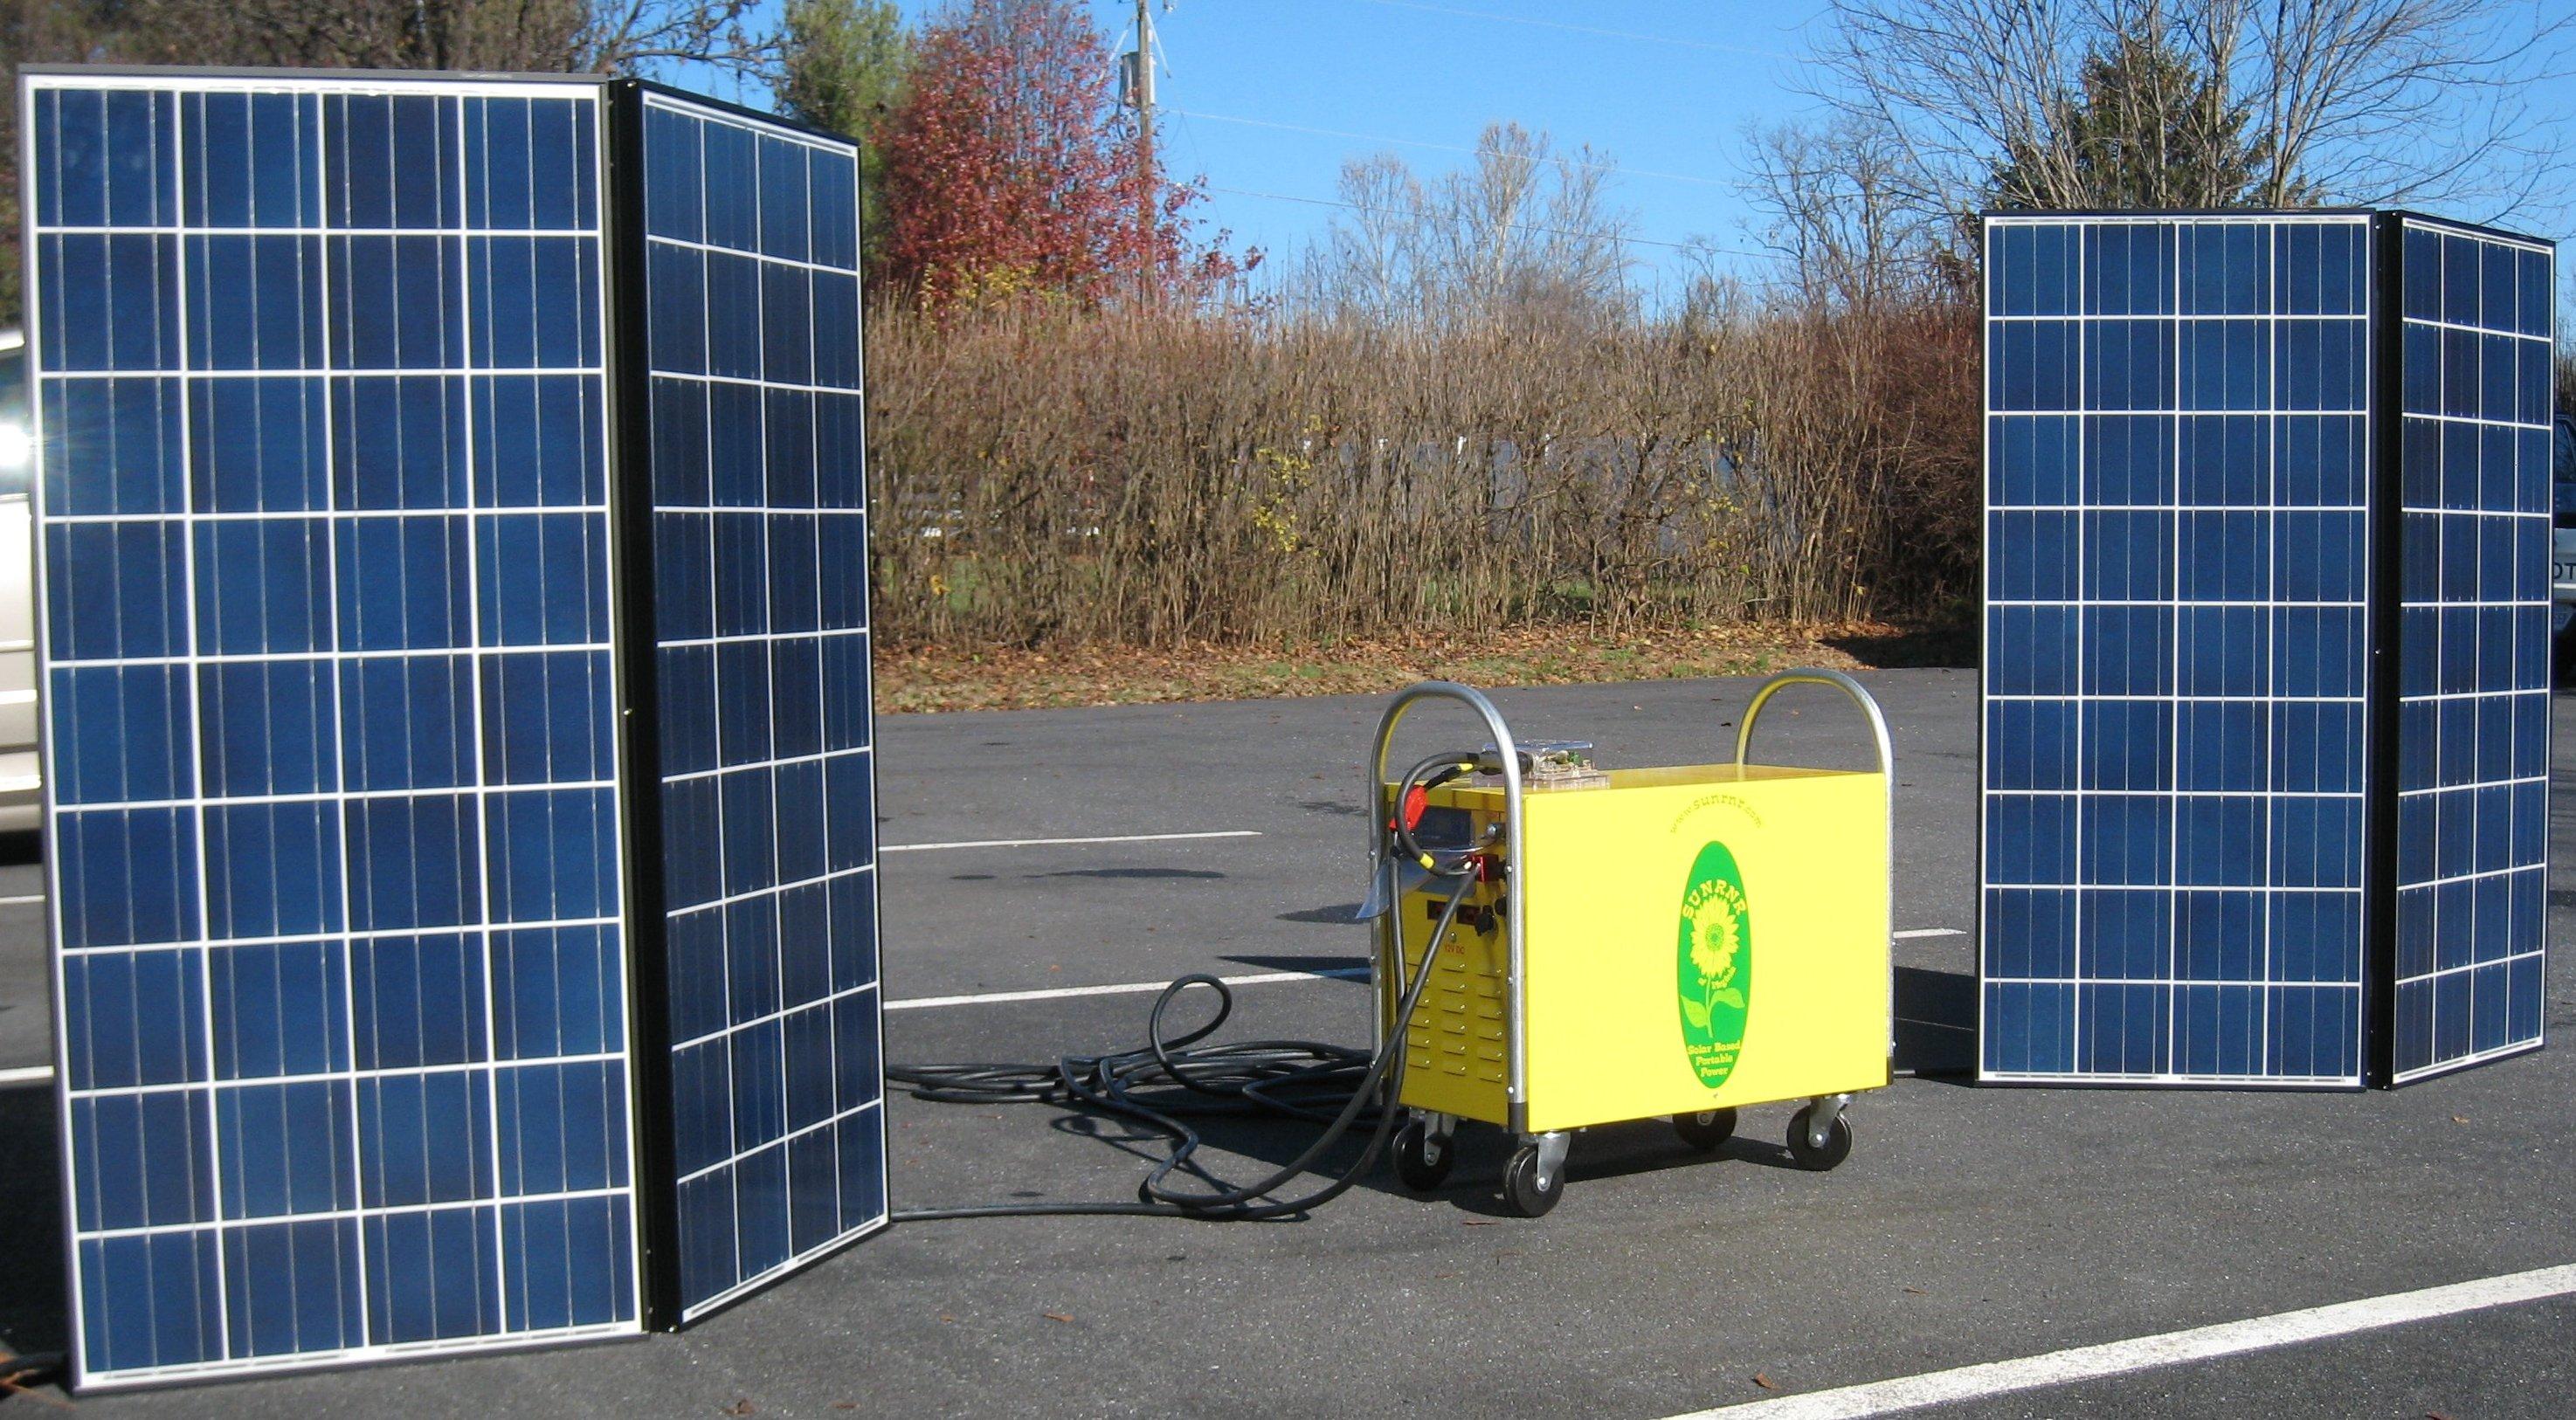 Thinkglobal Energy Products Marinesolarpanelrvsolarpanelgif Sunrunr Portable Solar Plus Storage System